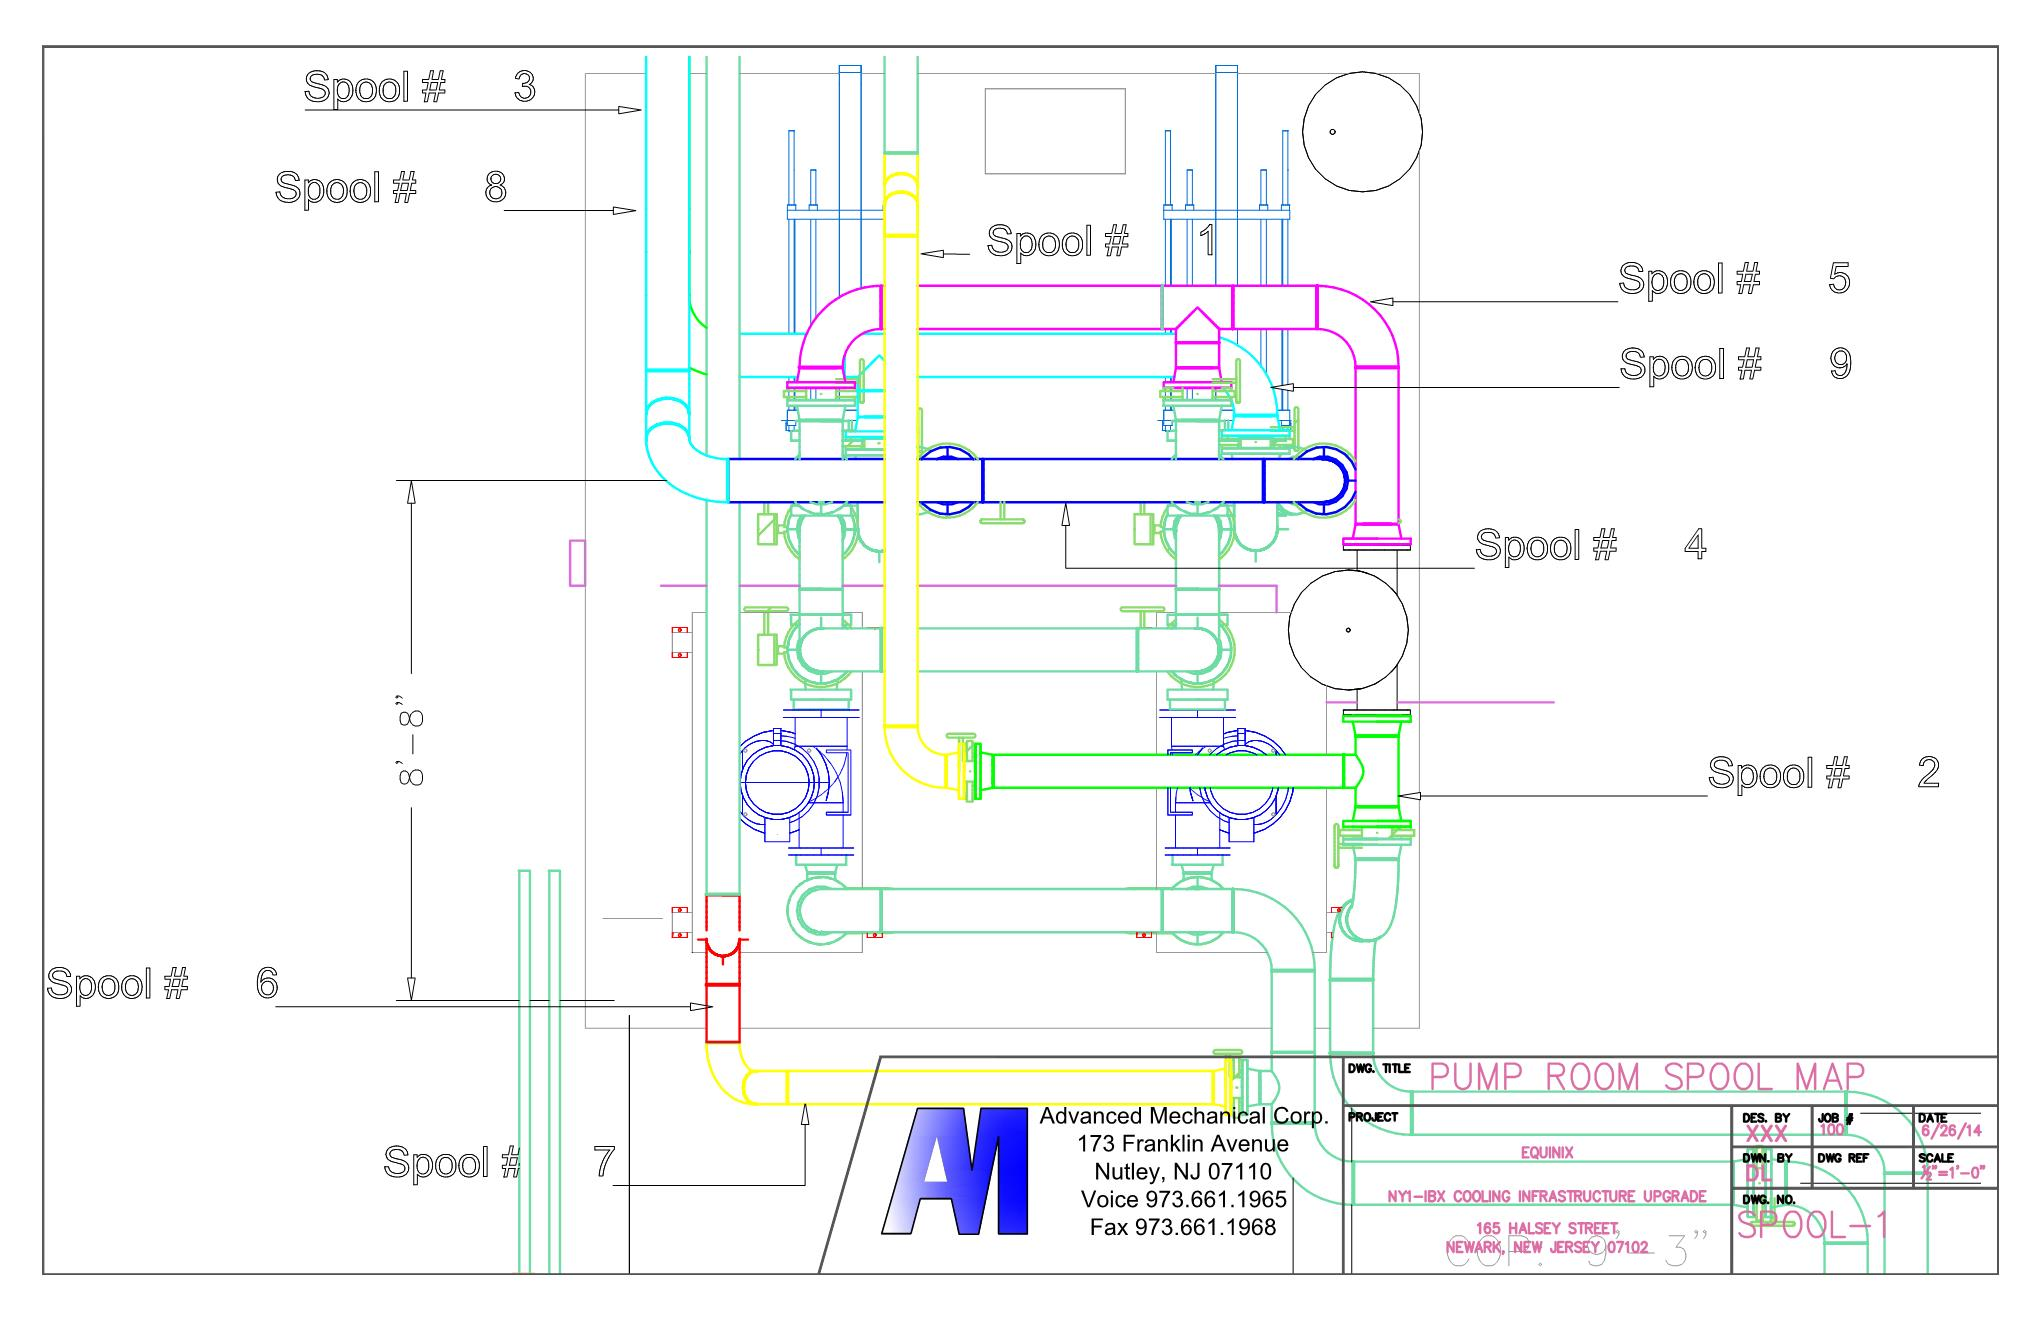 Bim0 Autocad Drawing Expertise Advanced Mechanical Corp Amc Hvac Dwg Other